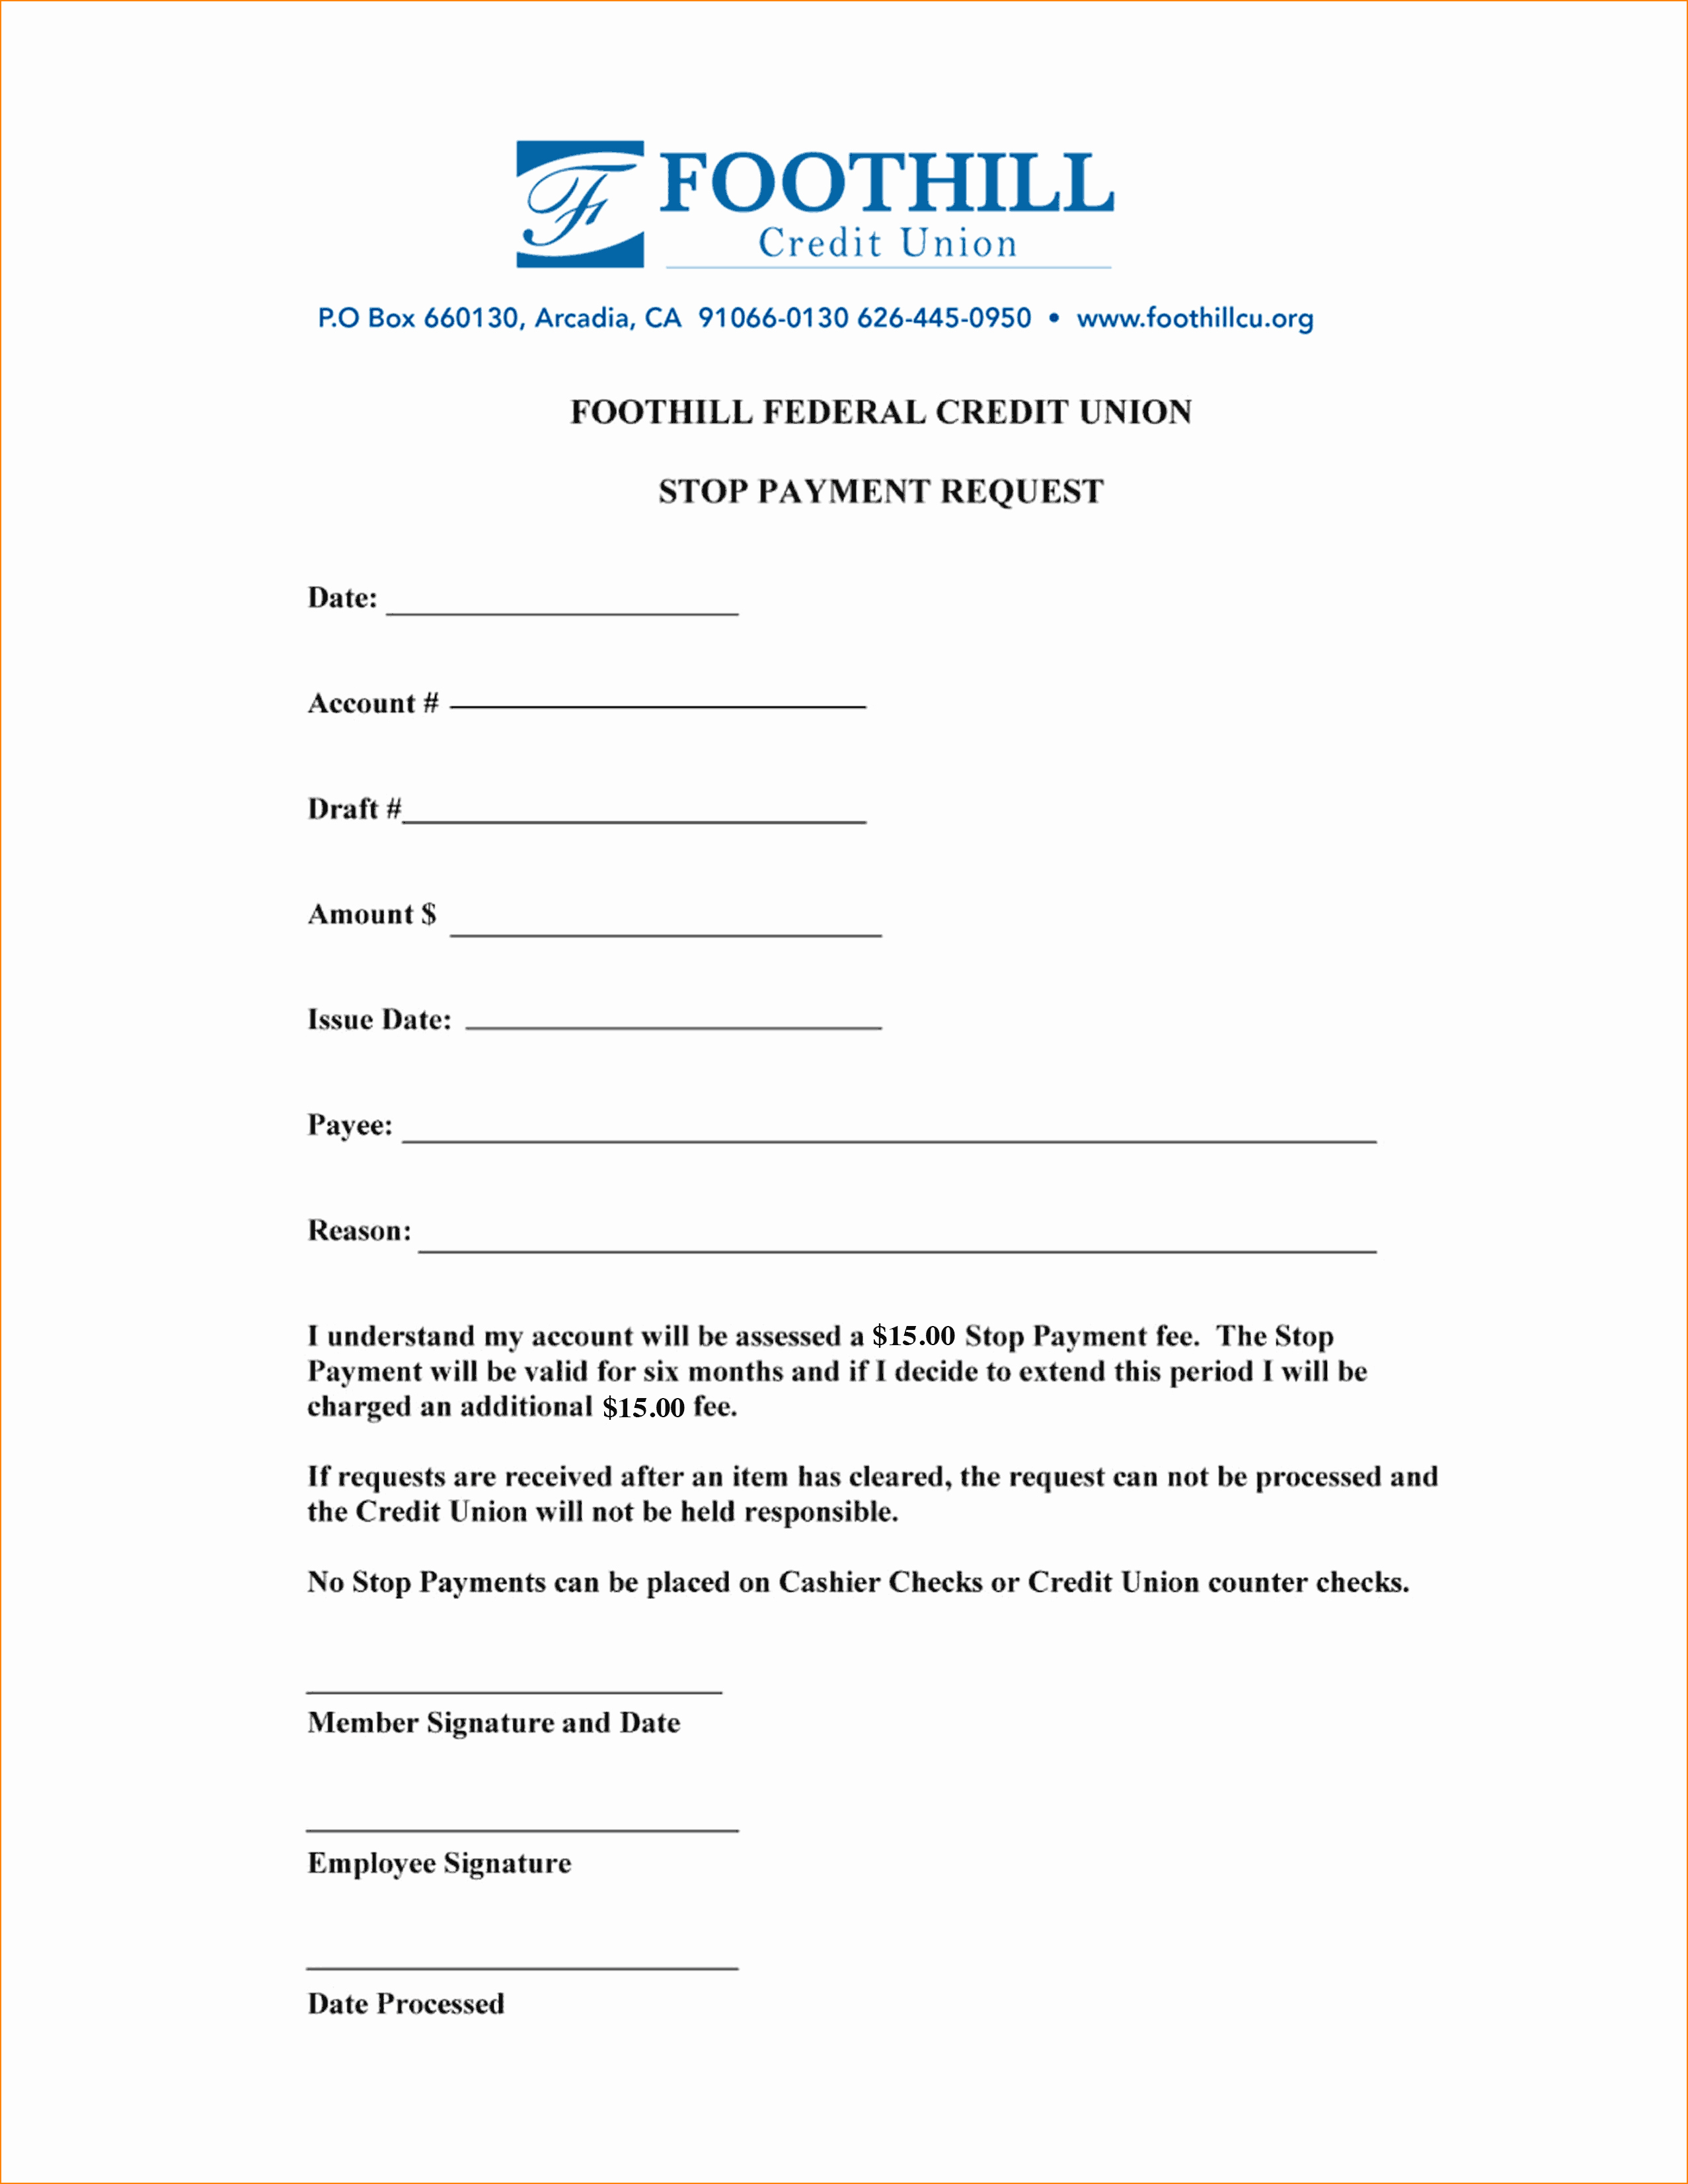 Ach Deposit Authorization form Template Luxury 14 Ach Payment Authorization form